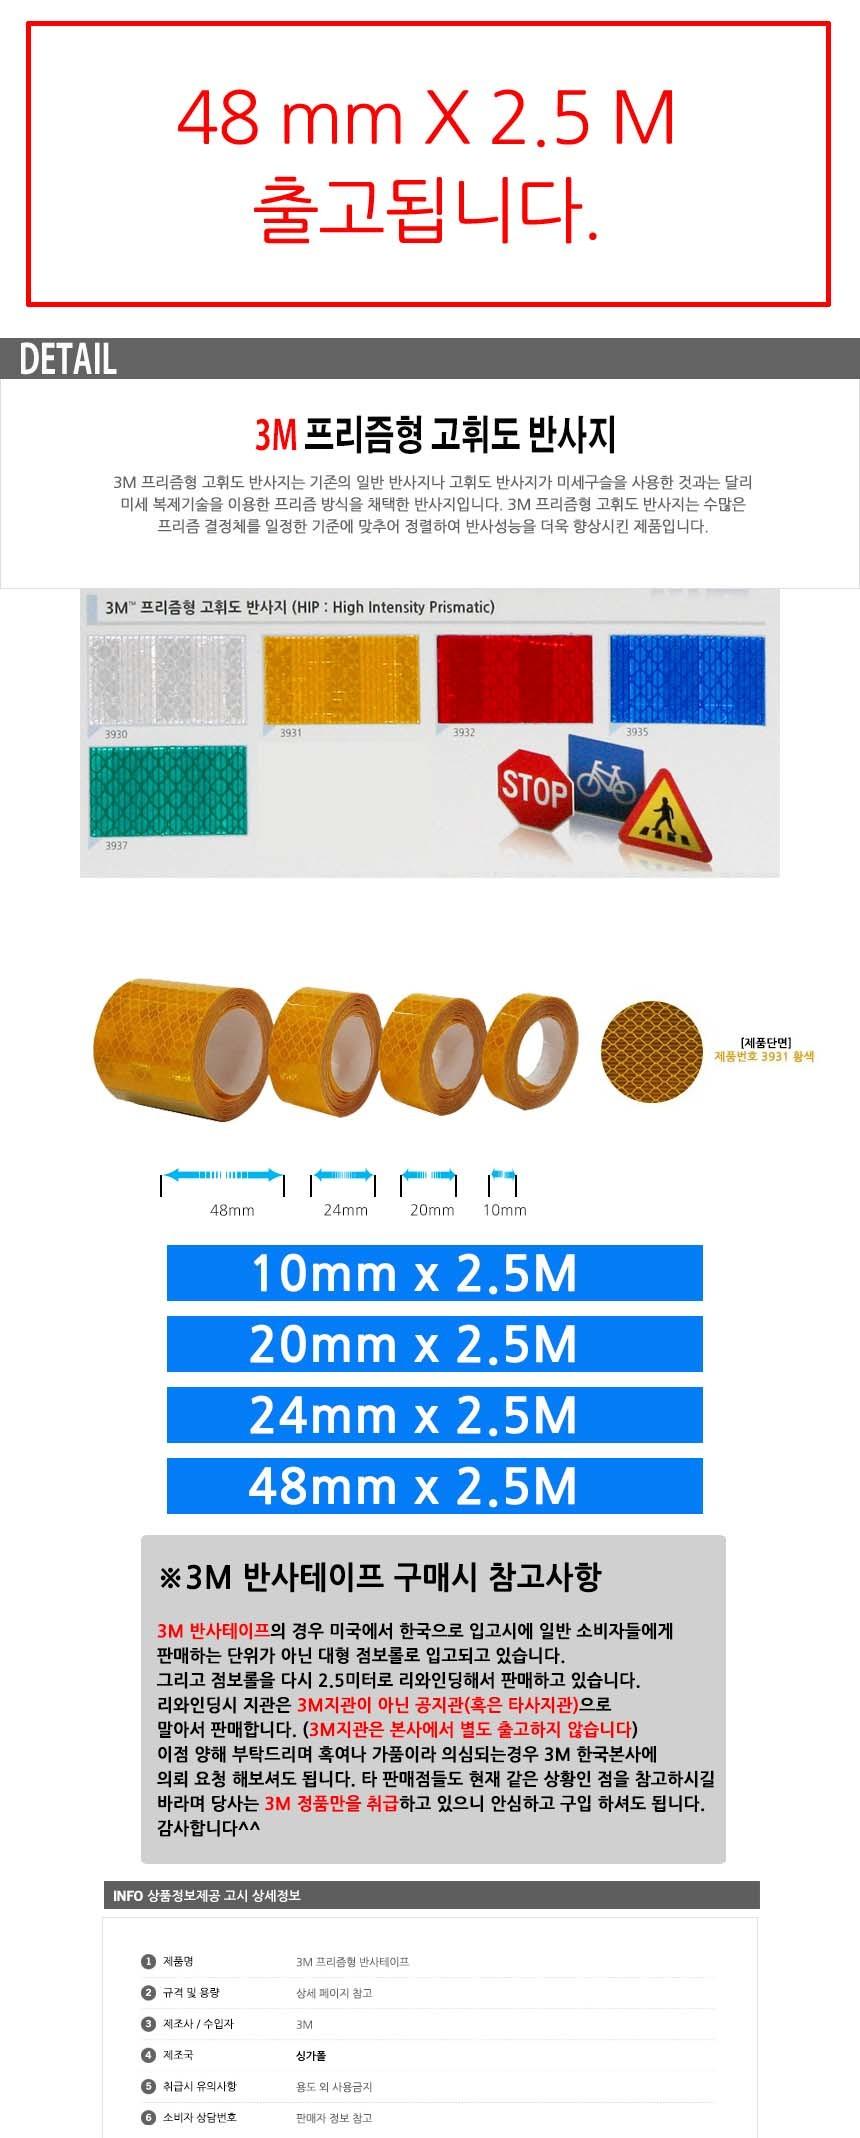 3M 프리즘형 고휘도 반사테이프 48mm x 2.5M 황색 테잎 반사테이프 반사테잎 안전테이프 안전표시 표시테이프 안전표시테잎 안전표시테이프 야간작업테이프 반사표시테이프